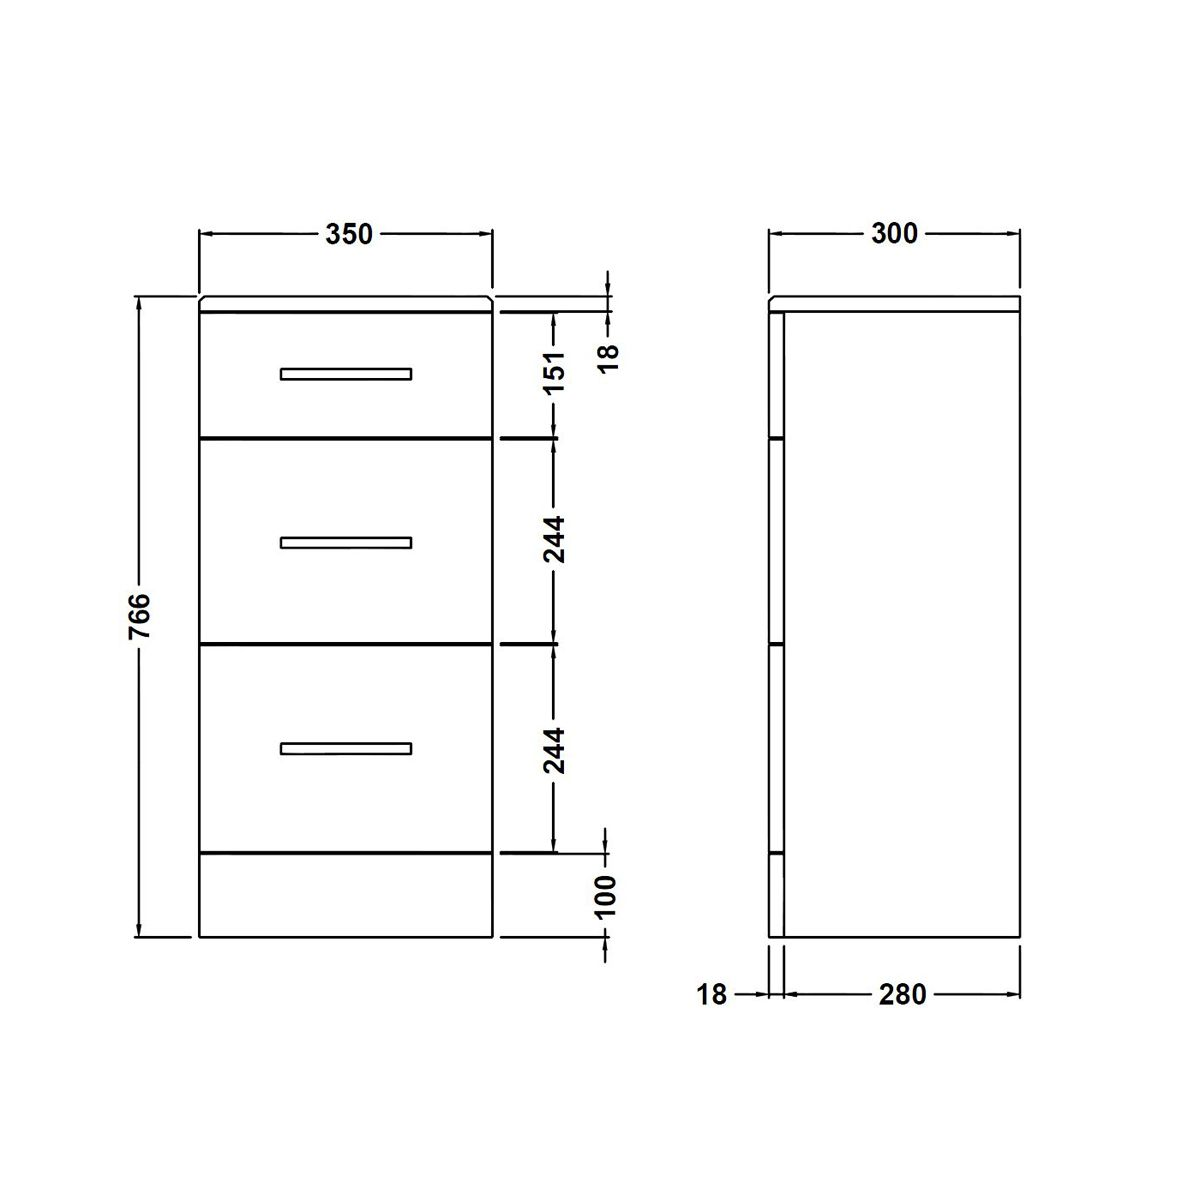 Premier High Gloss White 3 Drawer Storage Unit Dimensions